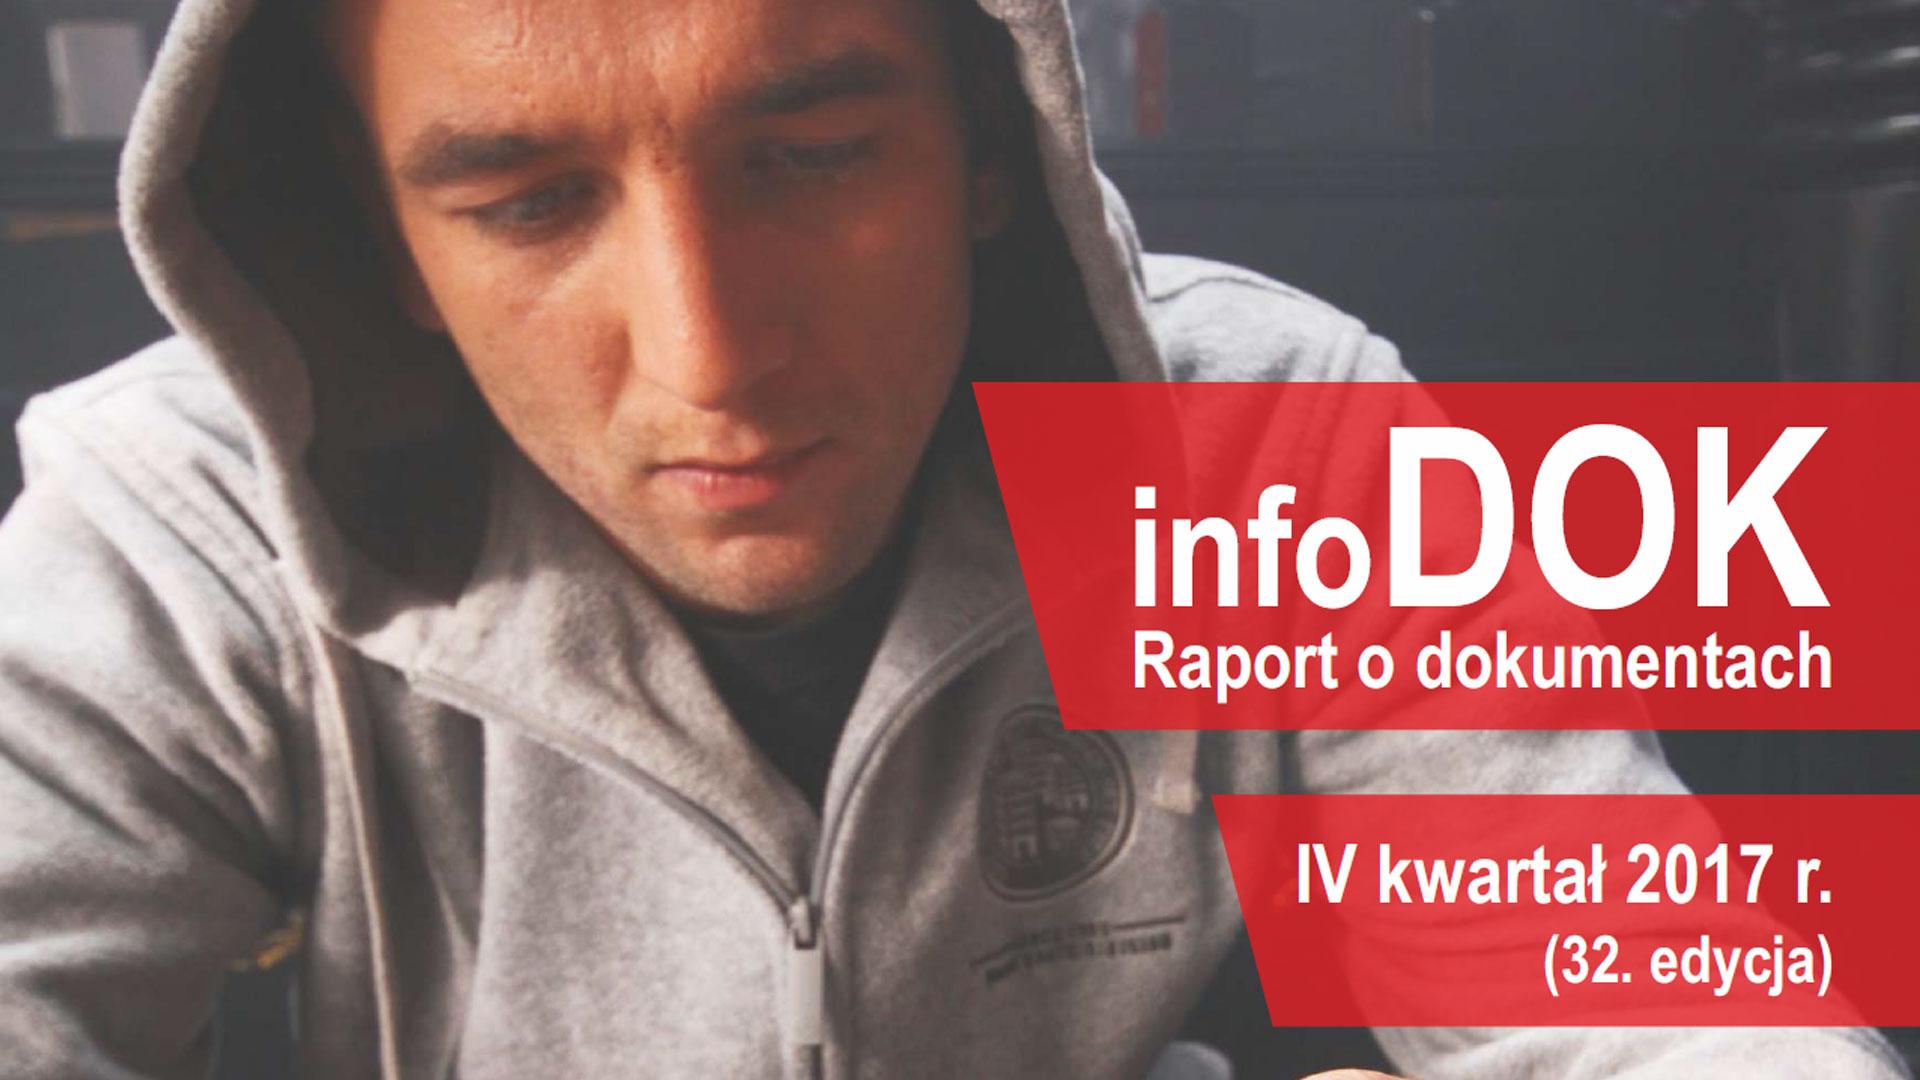 Raport o dokumentach infoDOK - 2017 Q4